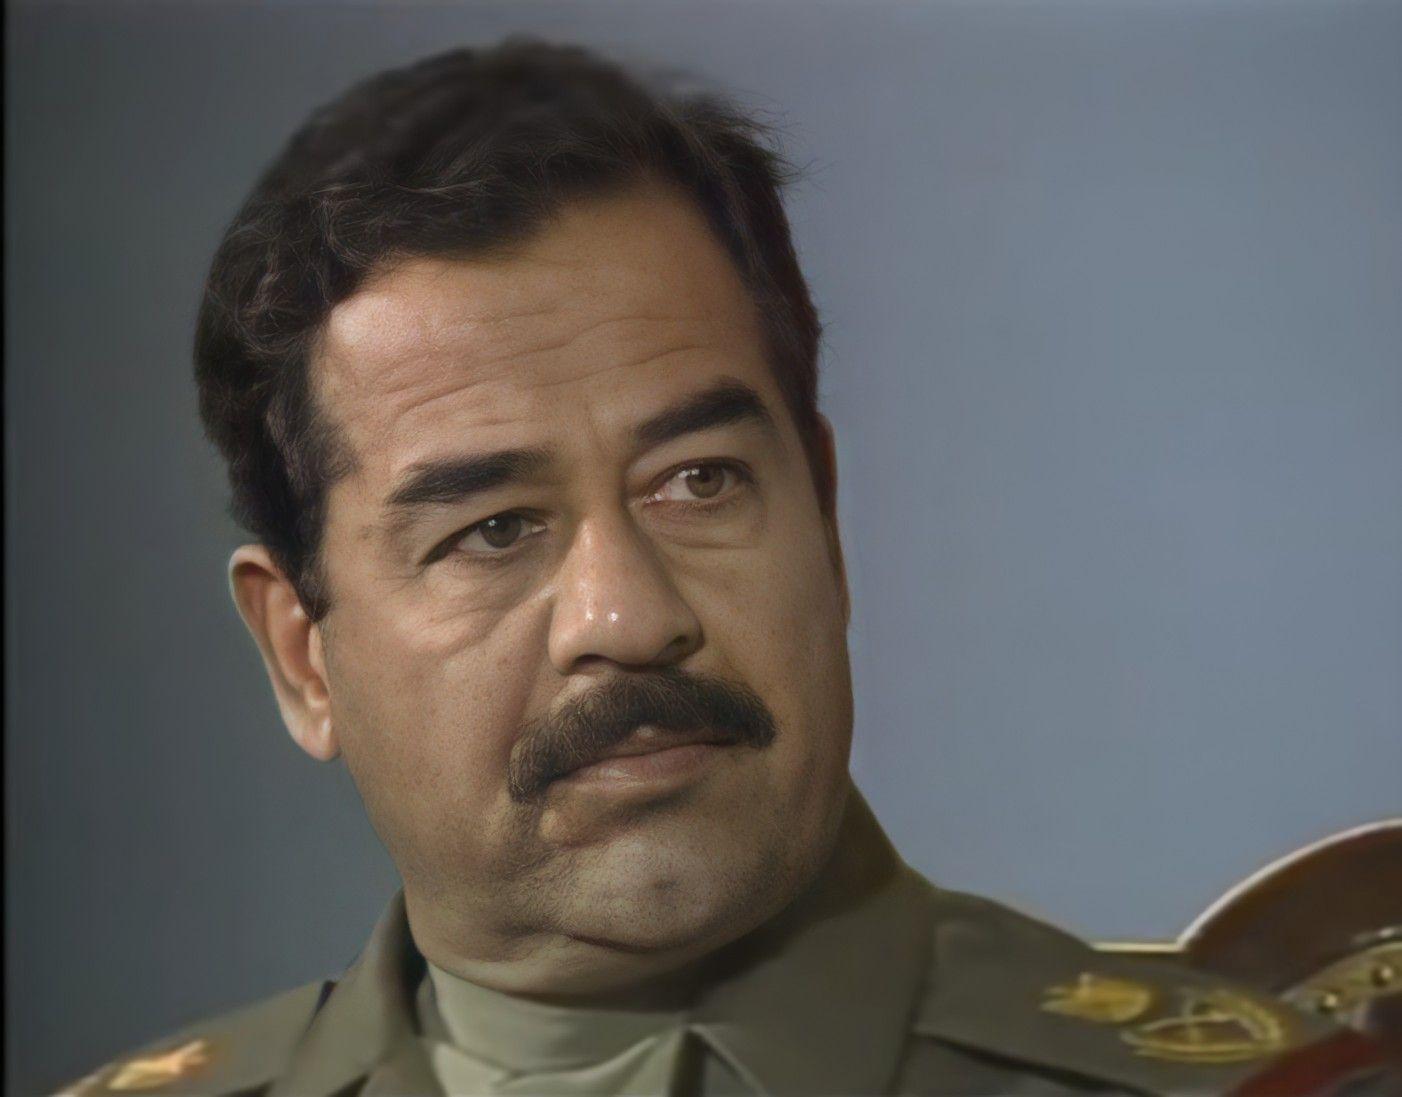 Pin On صور صدام حسين عالية الوضوح